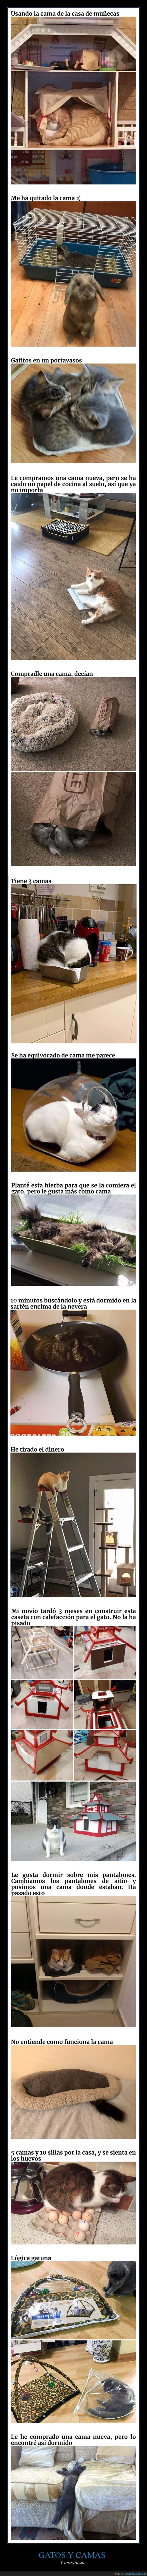 camas,gatos,lógica